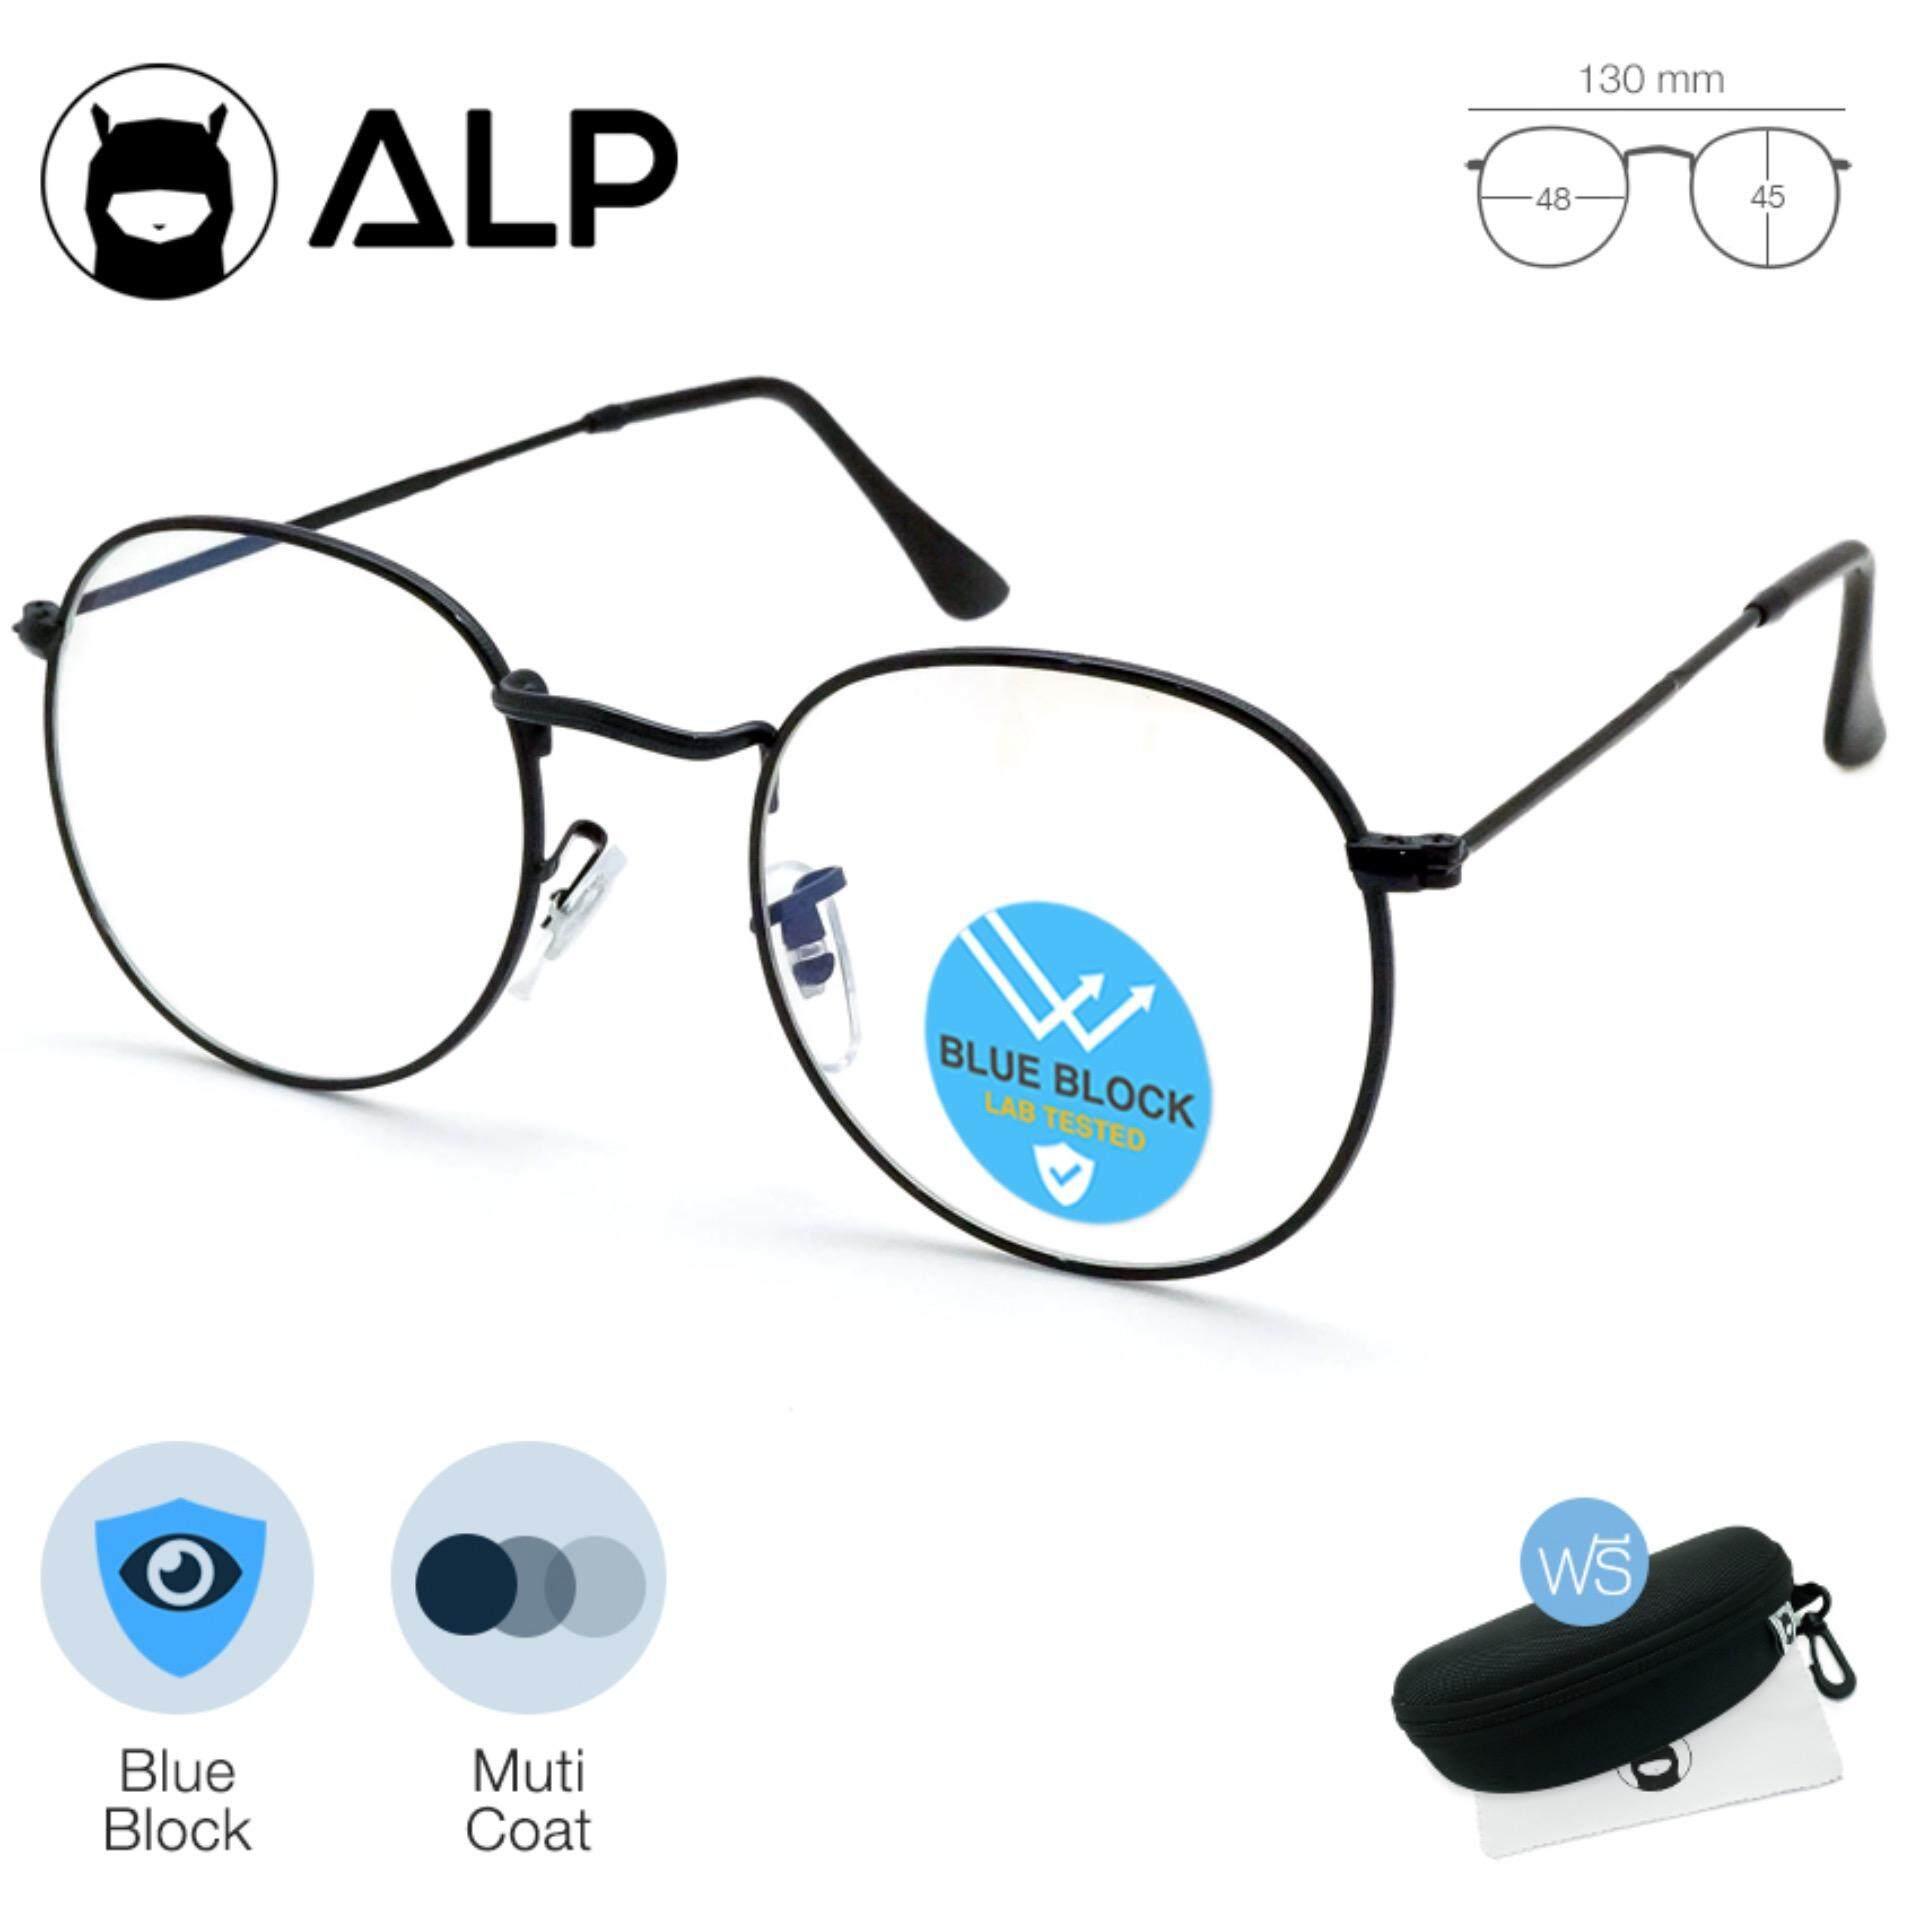 Alp Computer Glasses แว่นกรองแสง แว่นคอมพิวเตอร์ แถมกล่อง กรองแสงสีฟ้า Blue Light Block กันรังสี Uv, Uva, Uvb กรอบแว่นตา Round Style รุ่น Alp-Bb0008 By Alpaca.